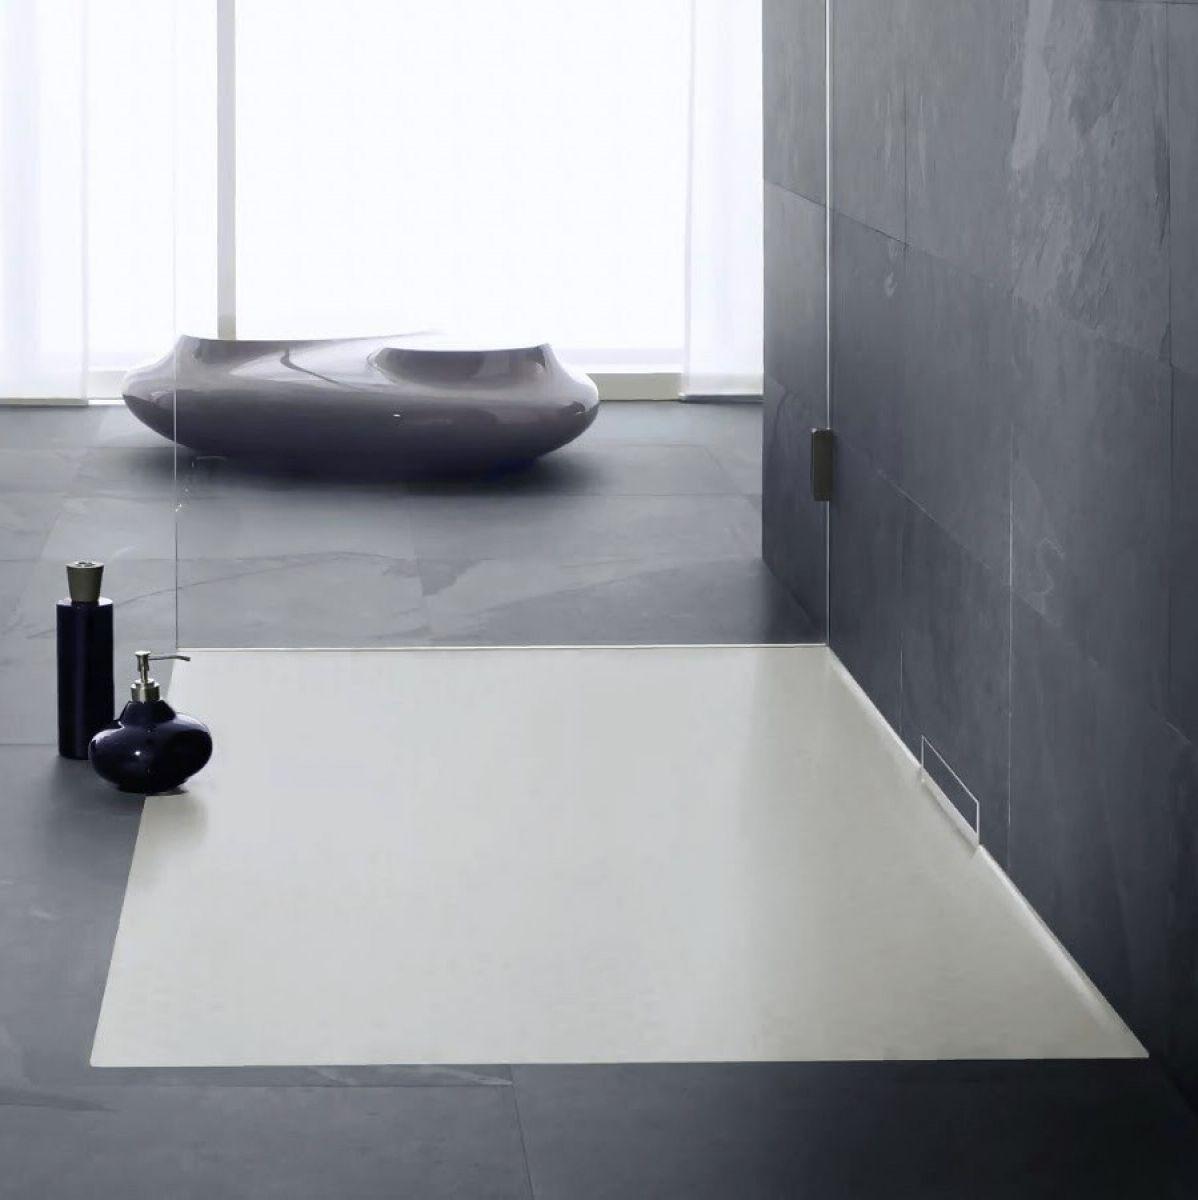 kaldewei xetis rectangular steel shower tray uk bathrooms. Black Bedroom Furniture Sets. Home Design Ideas